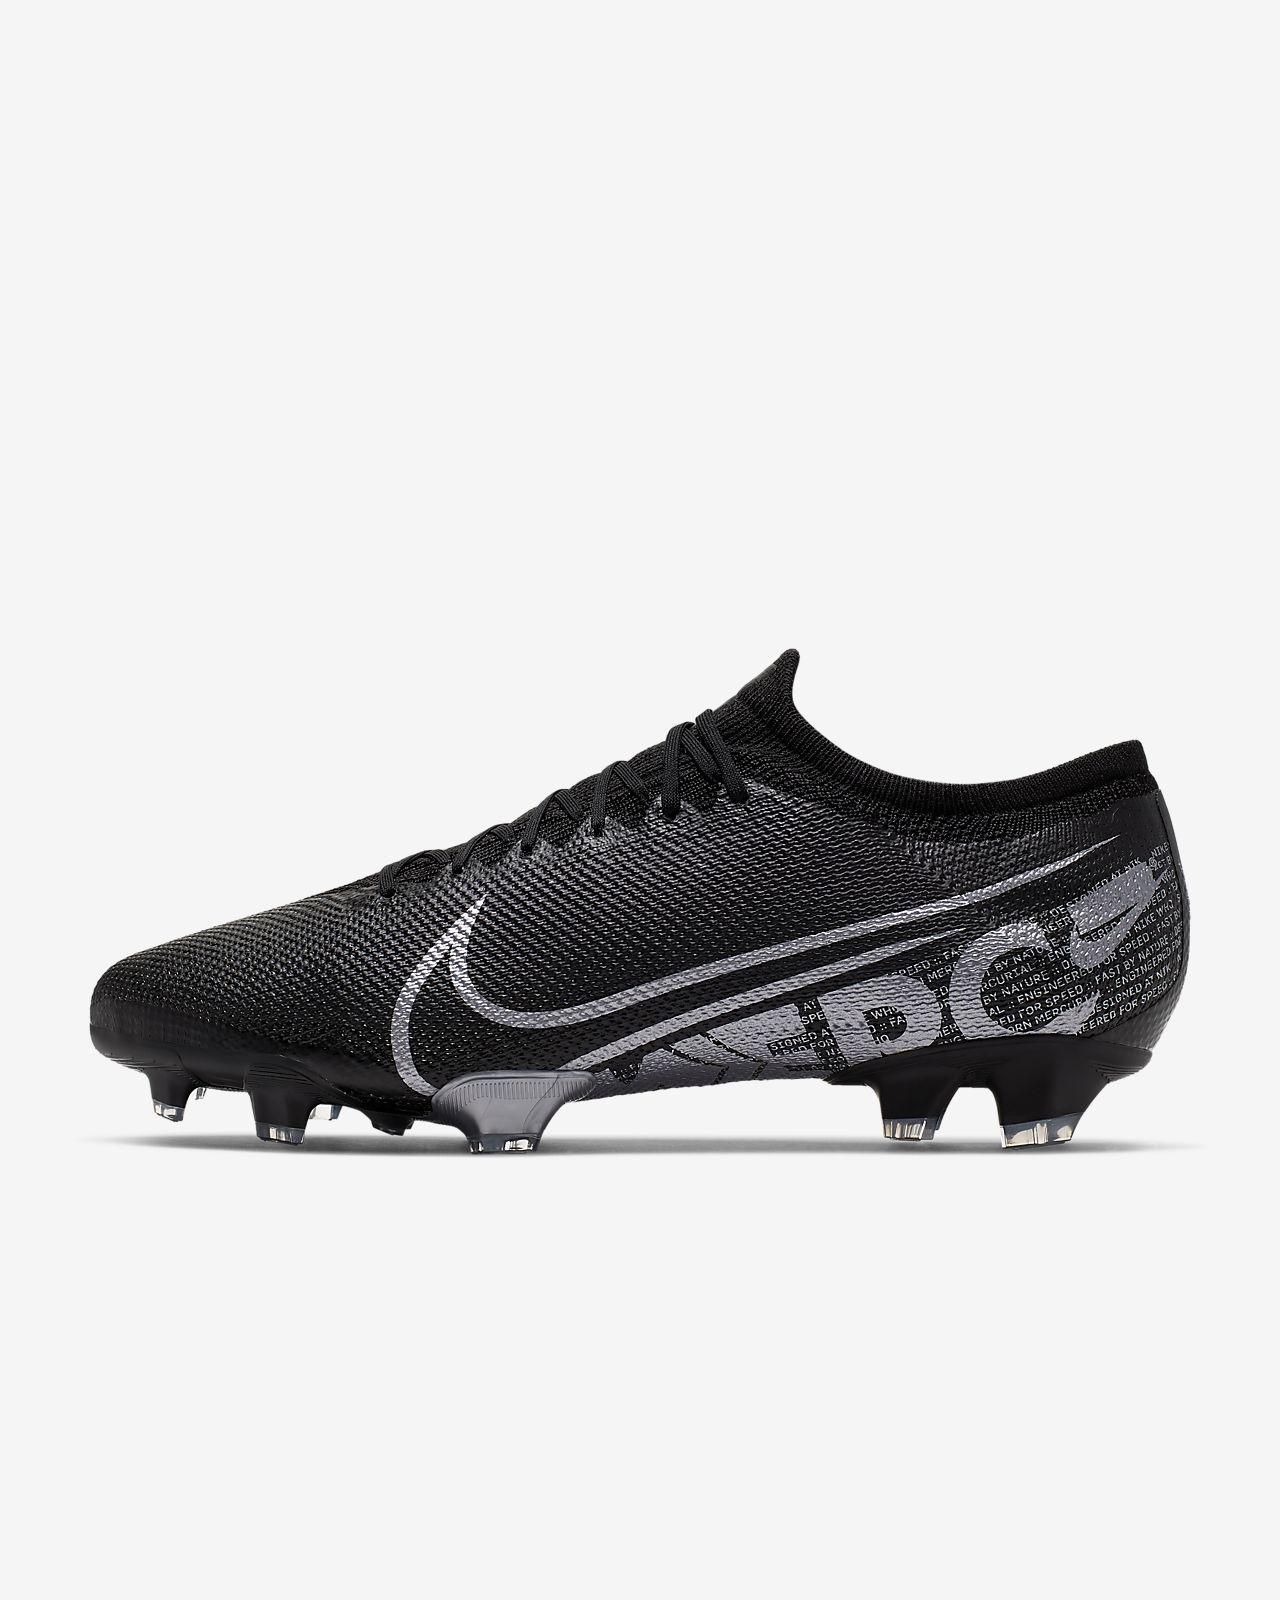 De Crampons Mercurial Vapor Football 13 Nike Pro Fg Sec Chaussure À Pour Terrain n08wOvmN